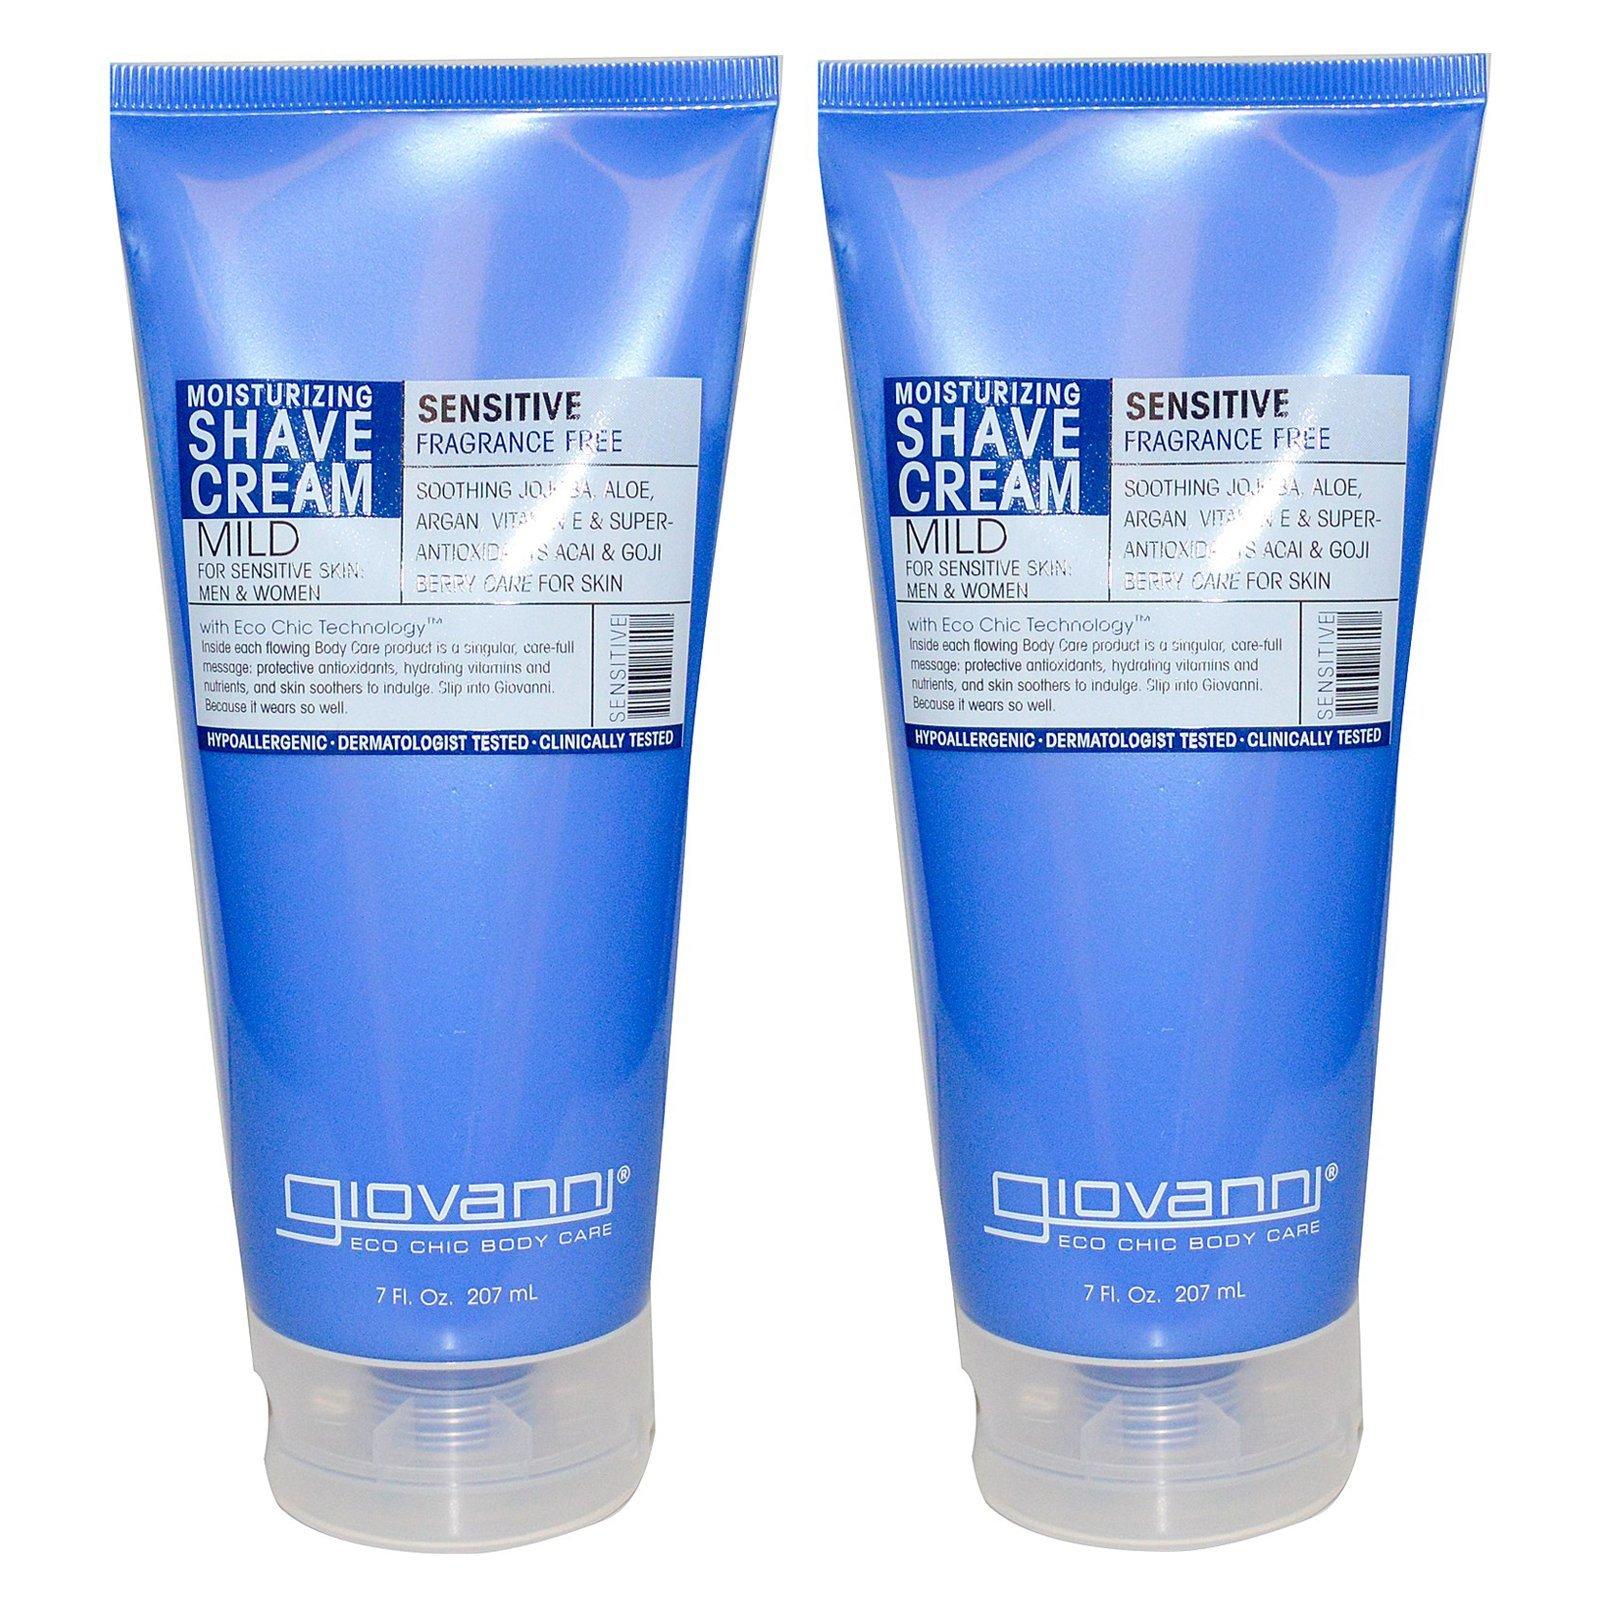 Giovanni Moisturizing Sensitive Shave Cream For Men and Women With Soothing Jojoba, Aloe, Argan, Vitamin E, 7 fl oz (207 ml) (Pack of 2)